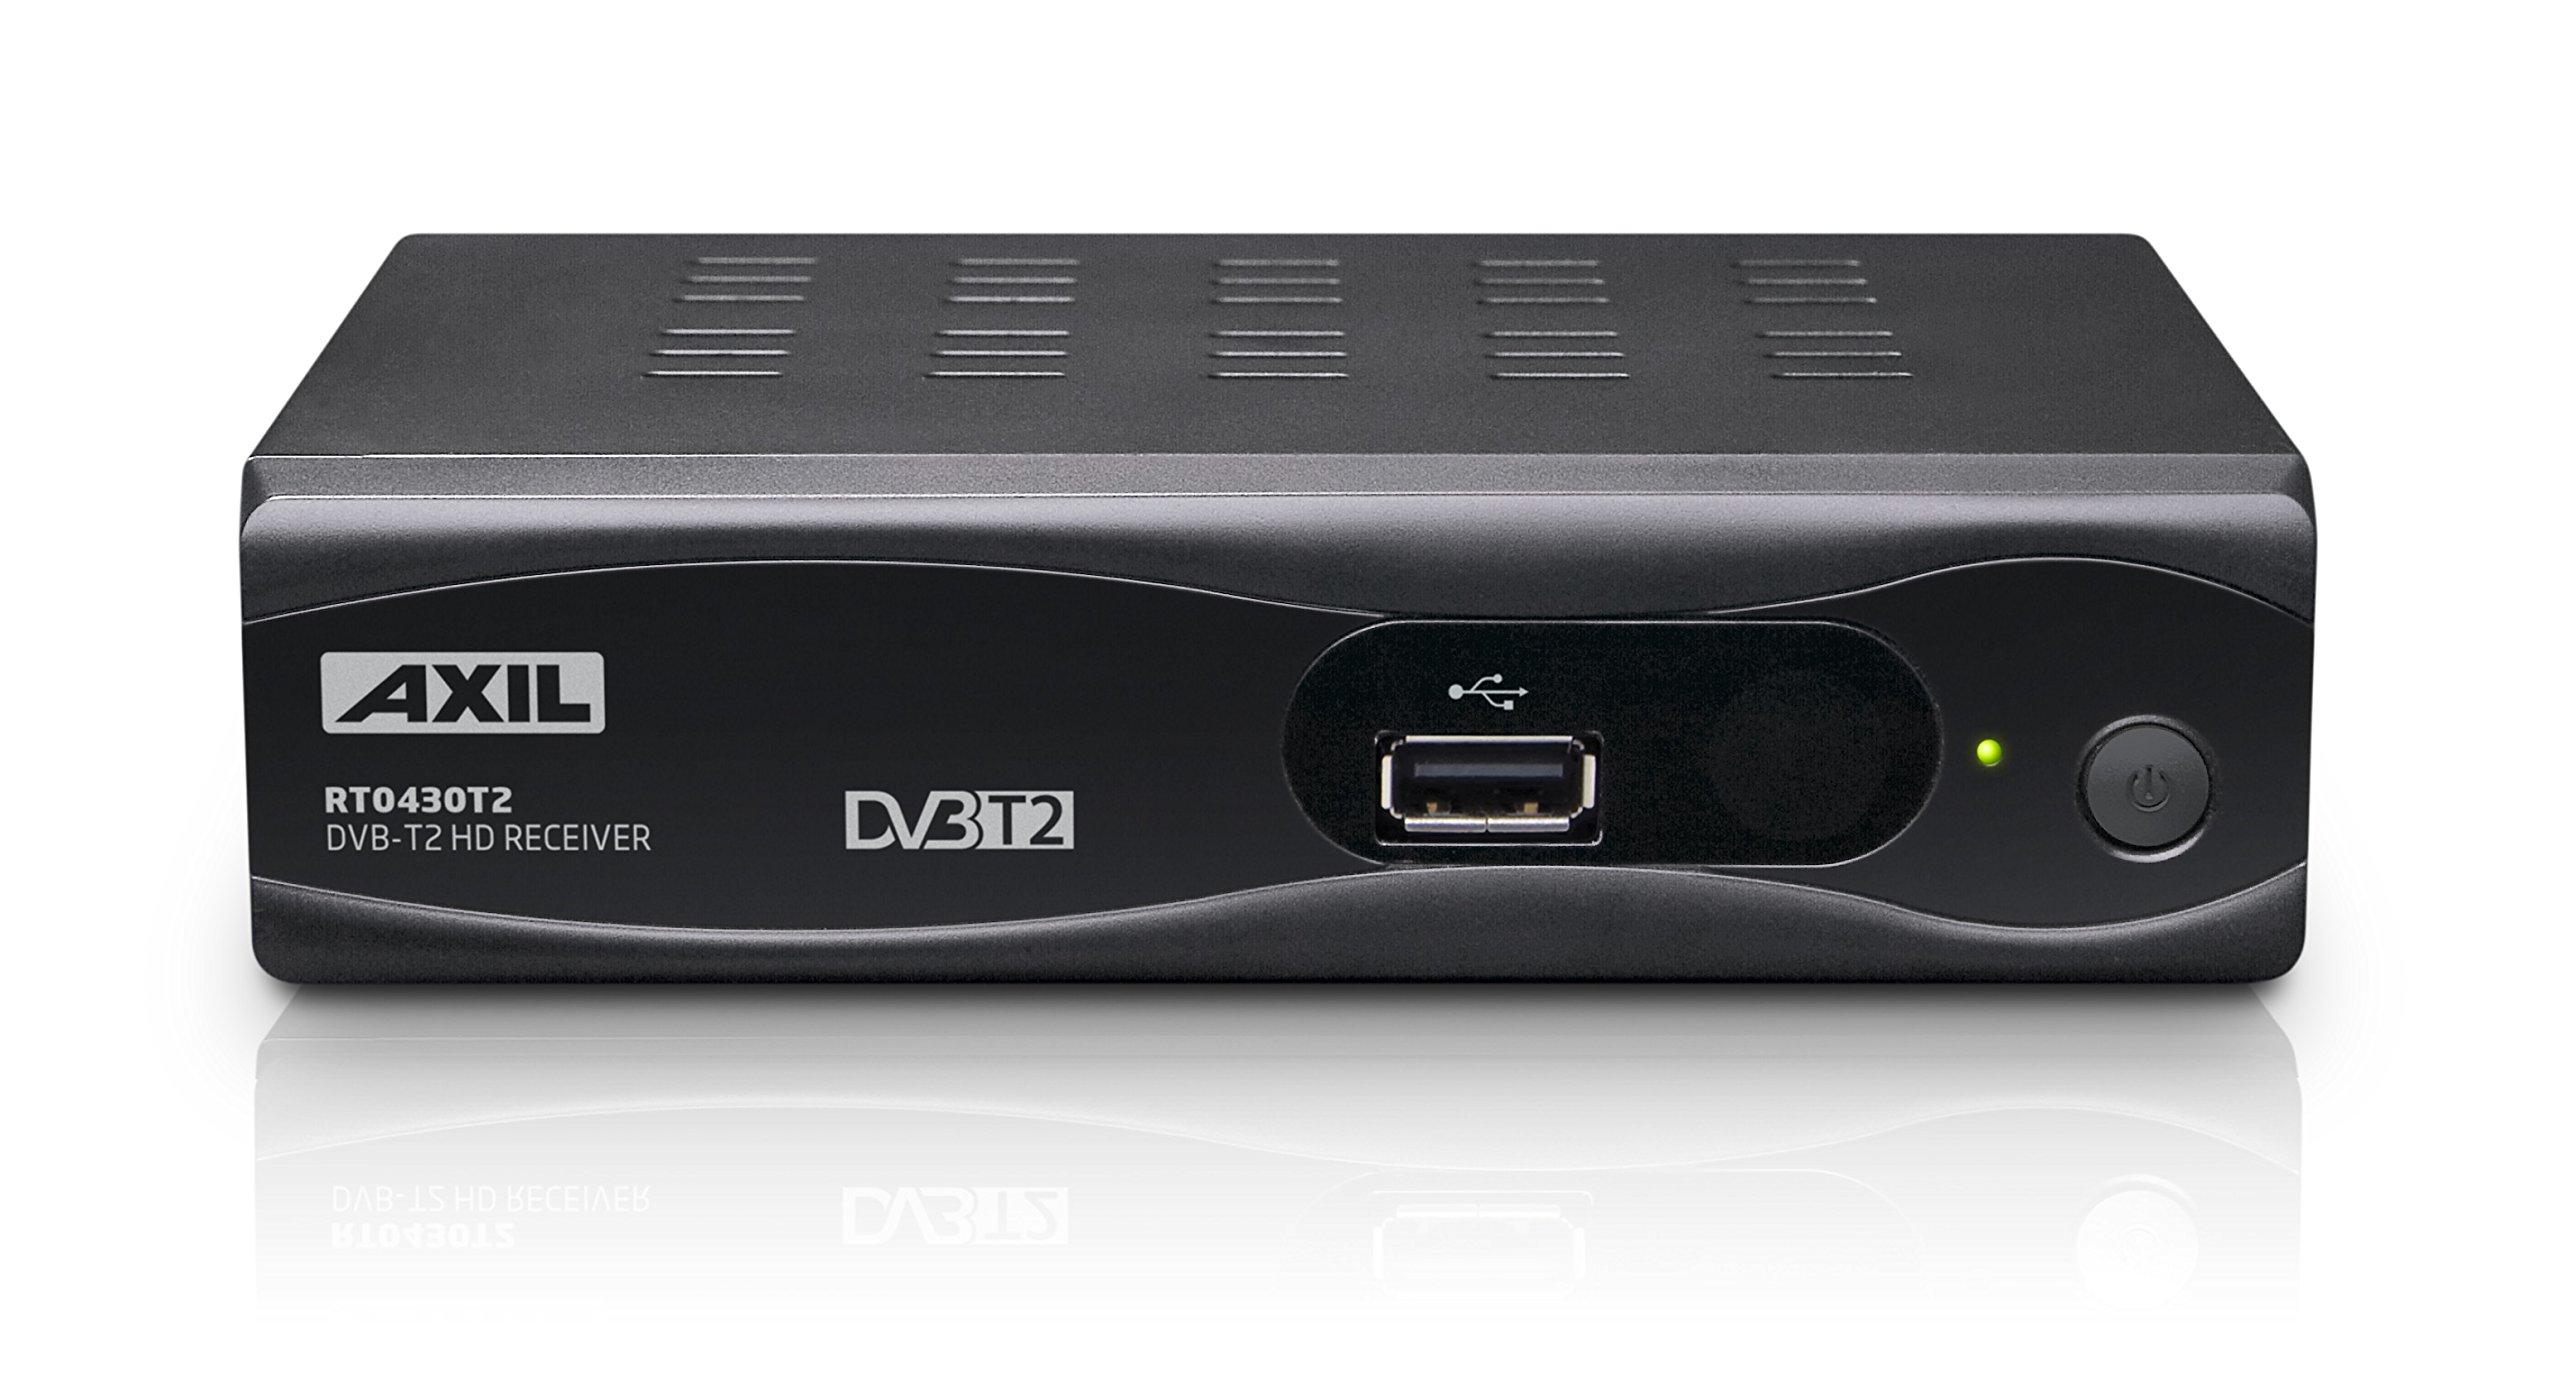 Engel Axil RT0430T2 - Receptor TDT (DVB-T2, HD, SCART, PVR